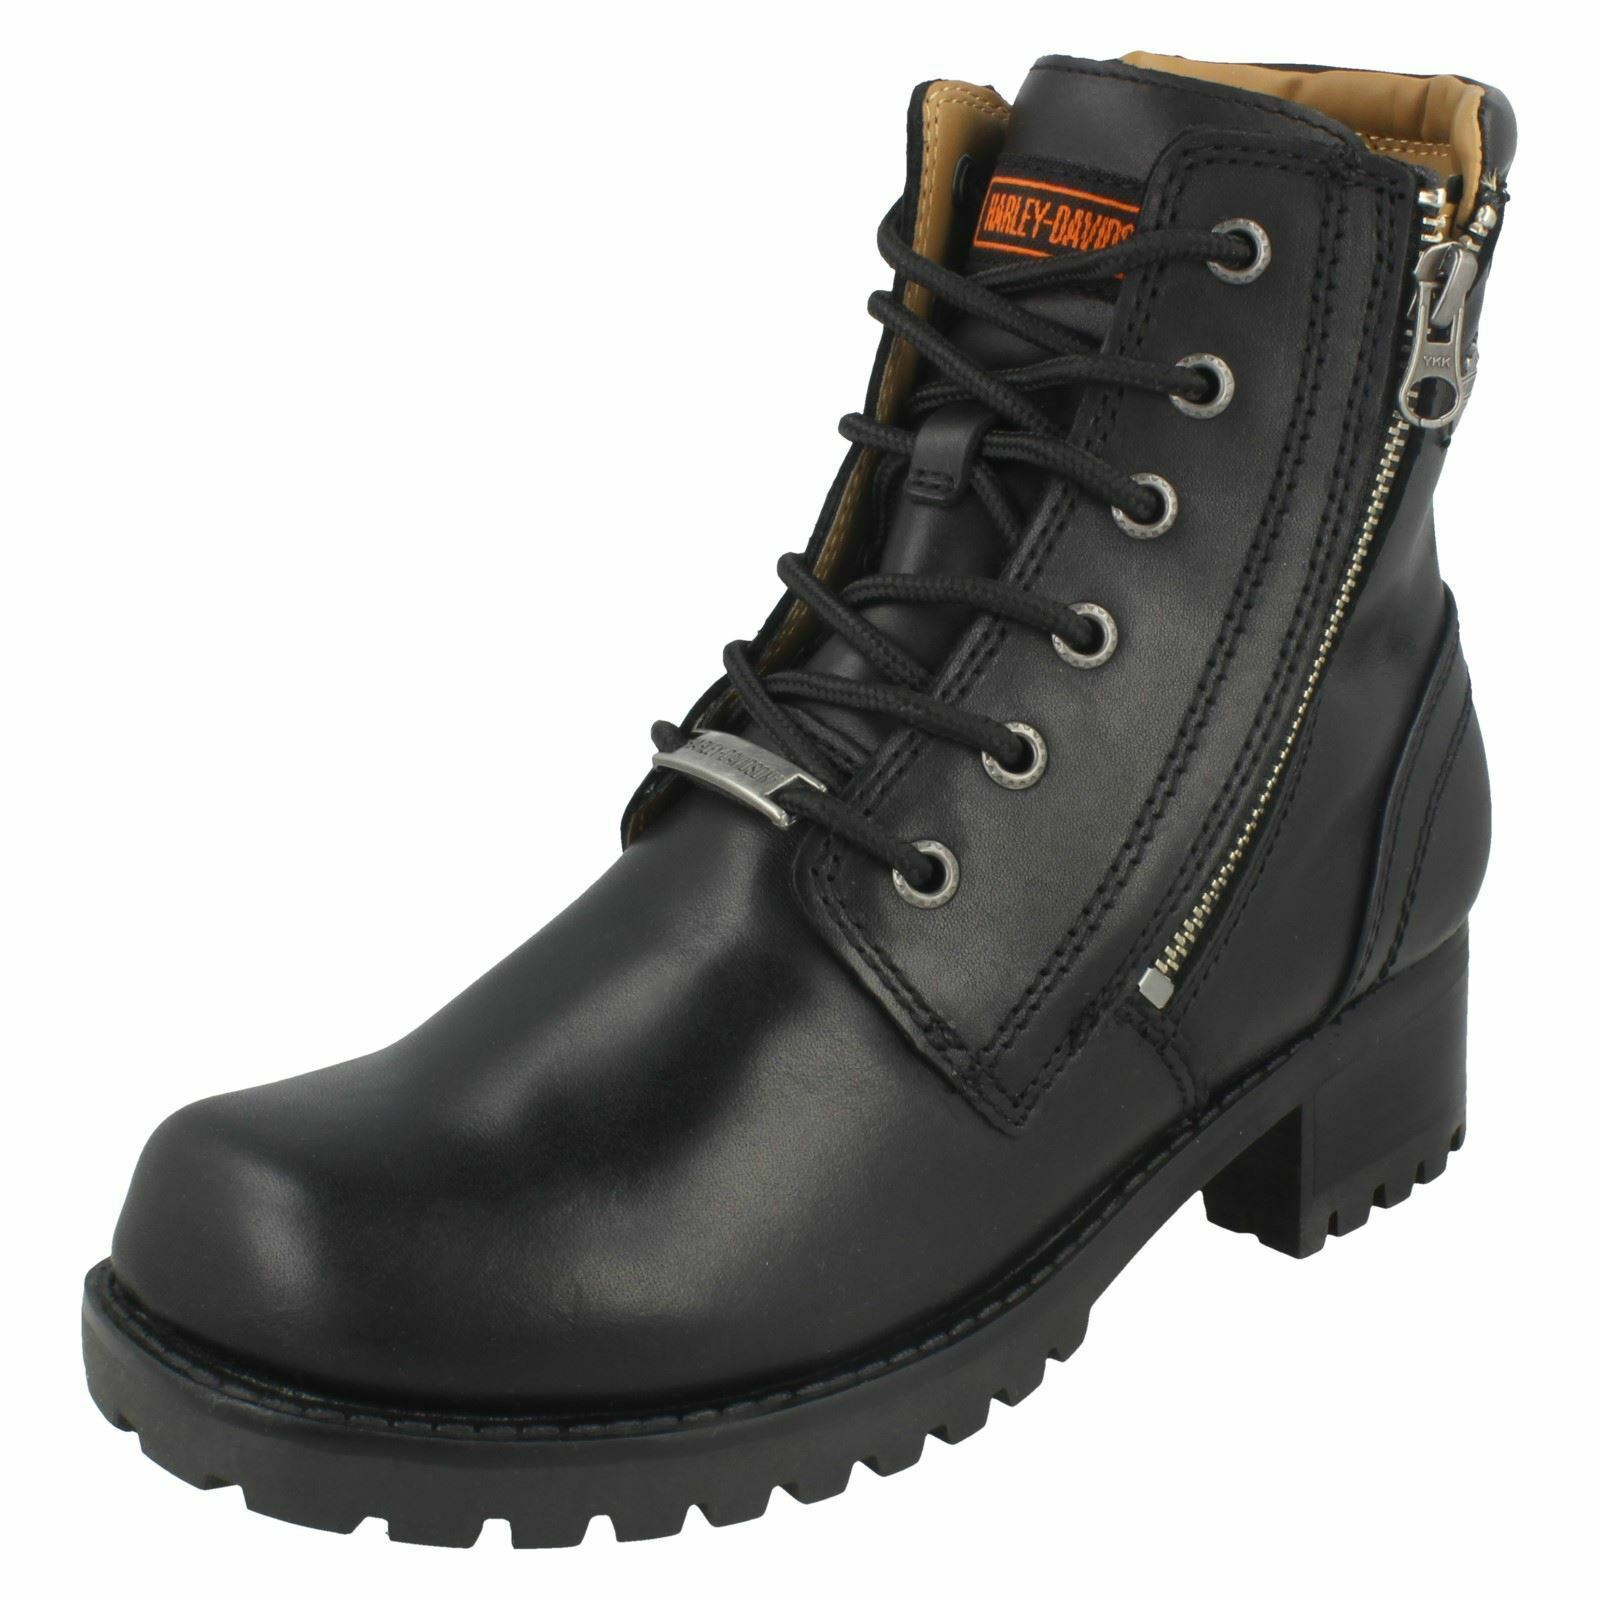 Grandes zapatos con descuento HAELEY DAVIDSON ASHER LADIES LACE ZIP BLOCK HEEL BLACK CASUAL BIKER ANKLE BOOTS